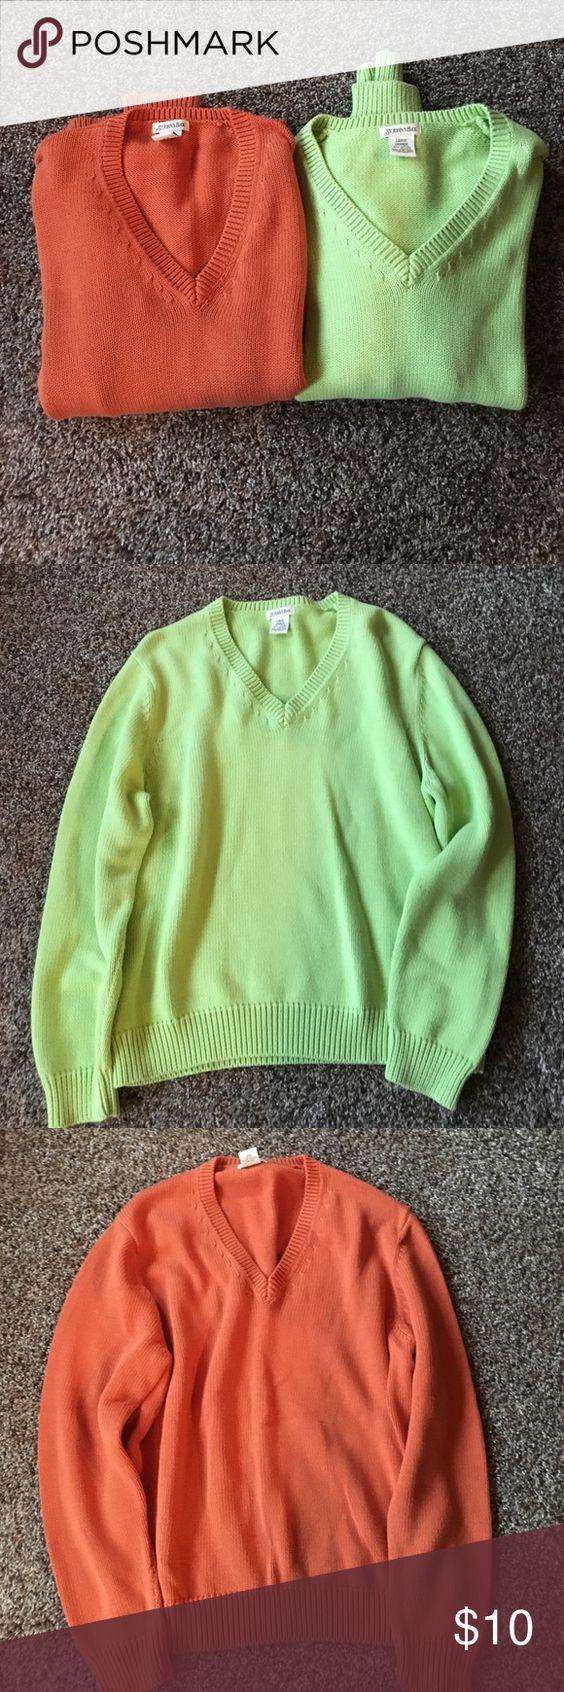 Bundle of never worn sweaters Never worn St.Johns Bay Sweaters Crew & Scoop Necks